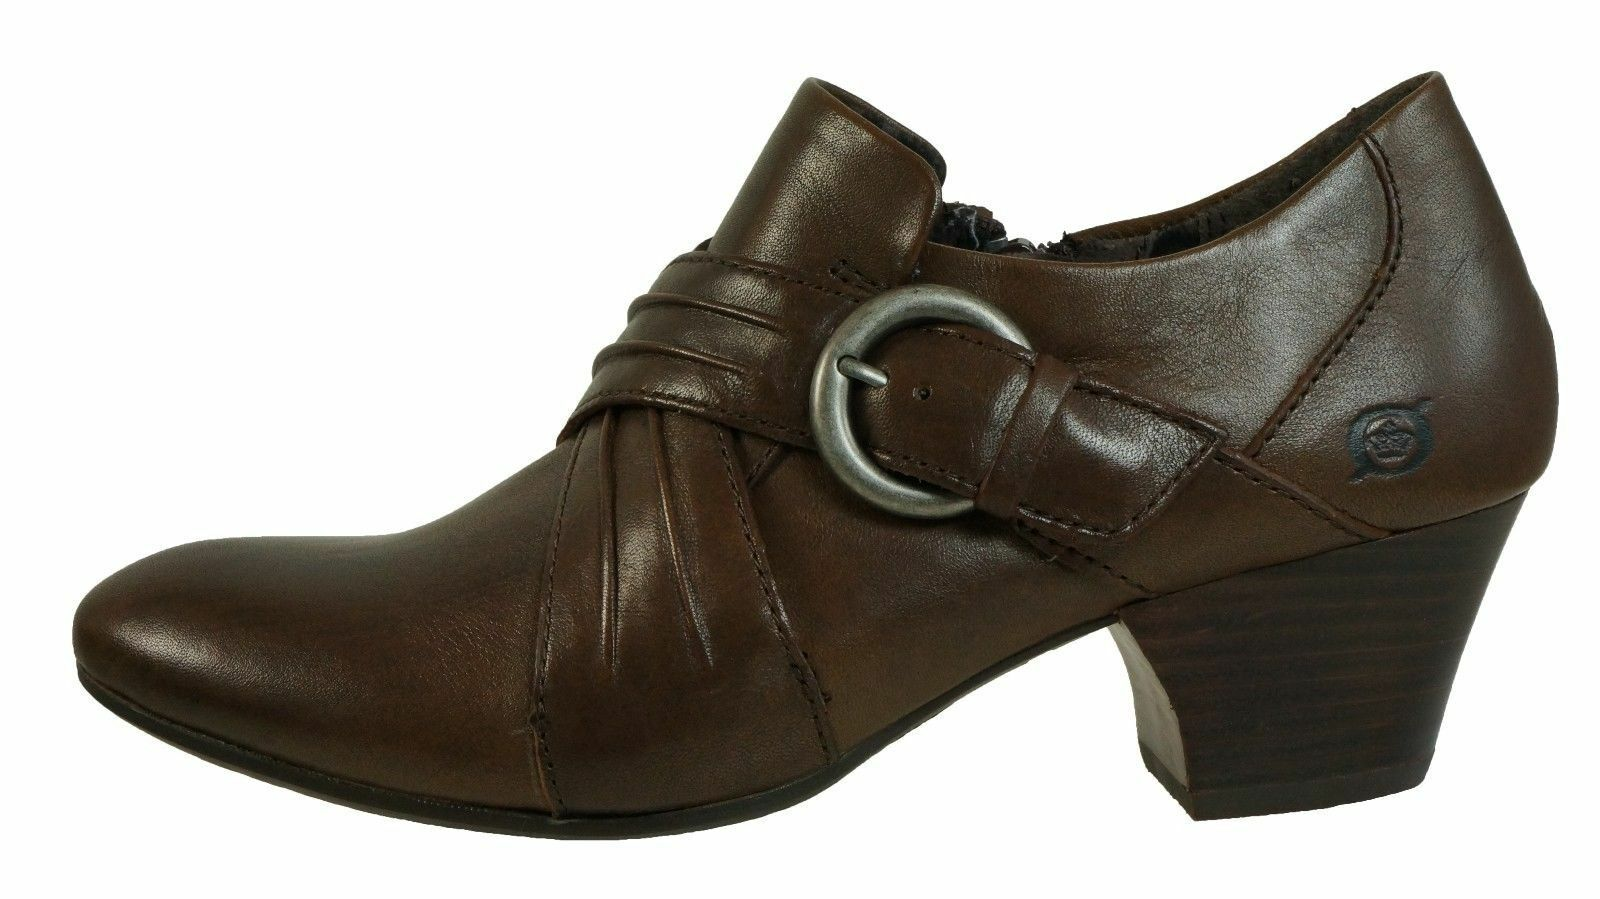 NIB BORN Women Nova Brown Cognac Leather Bootie sz 9.5M W EURO 41